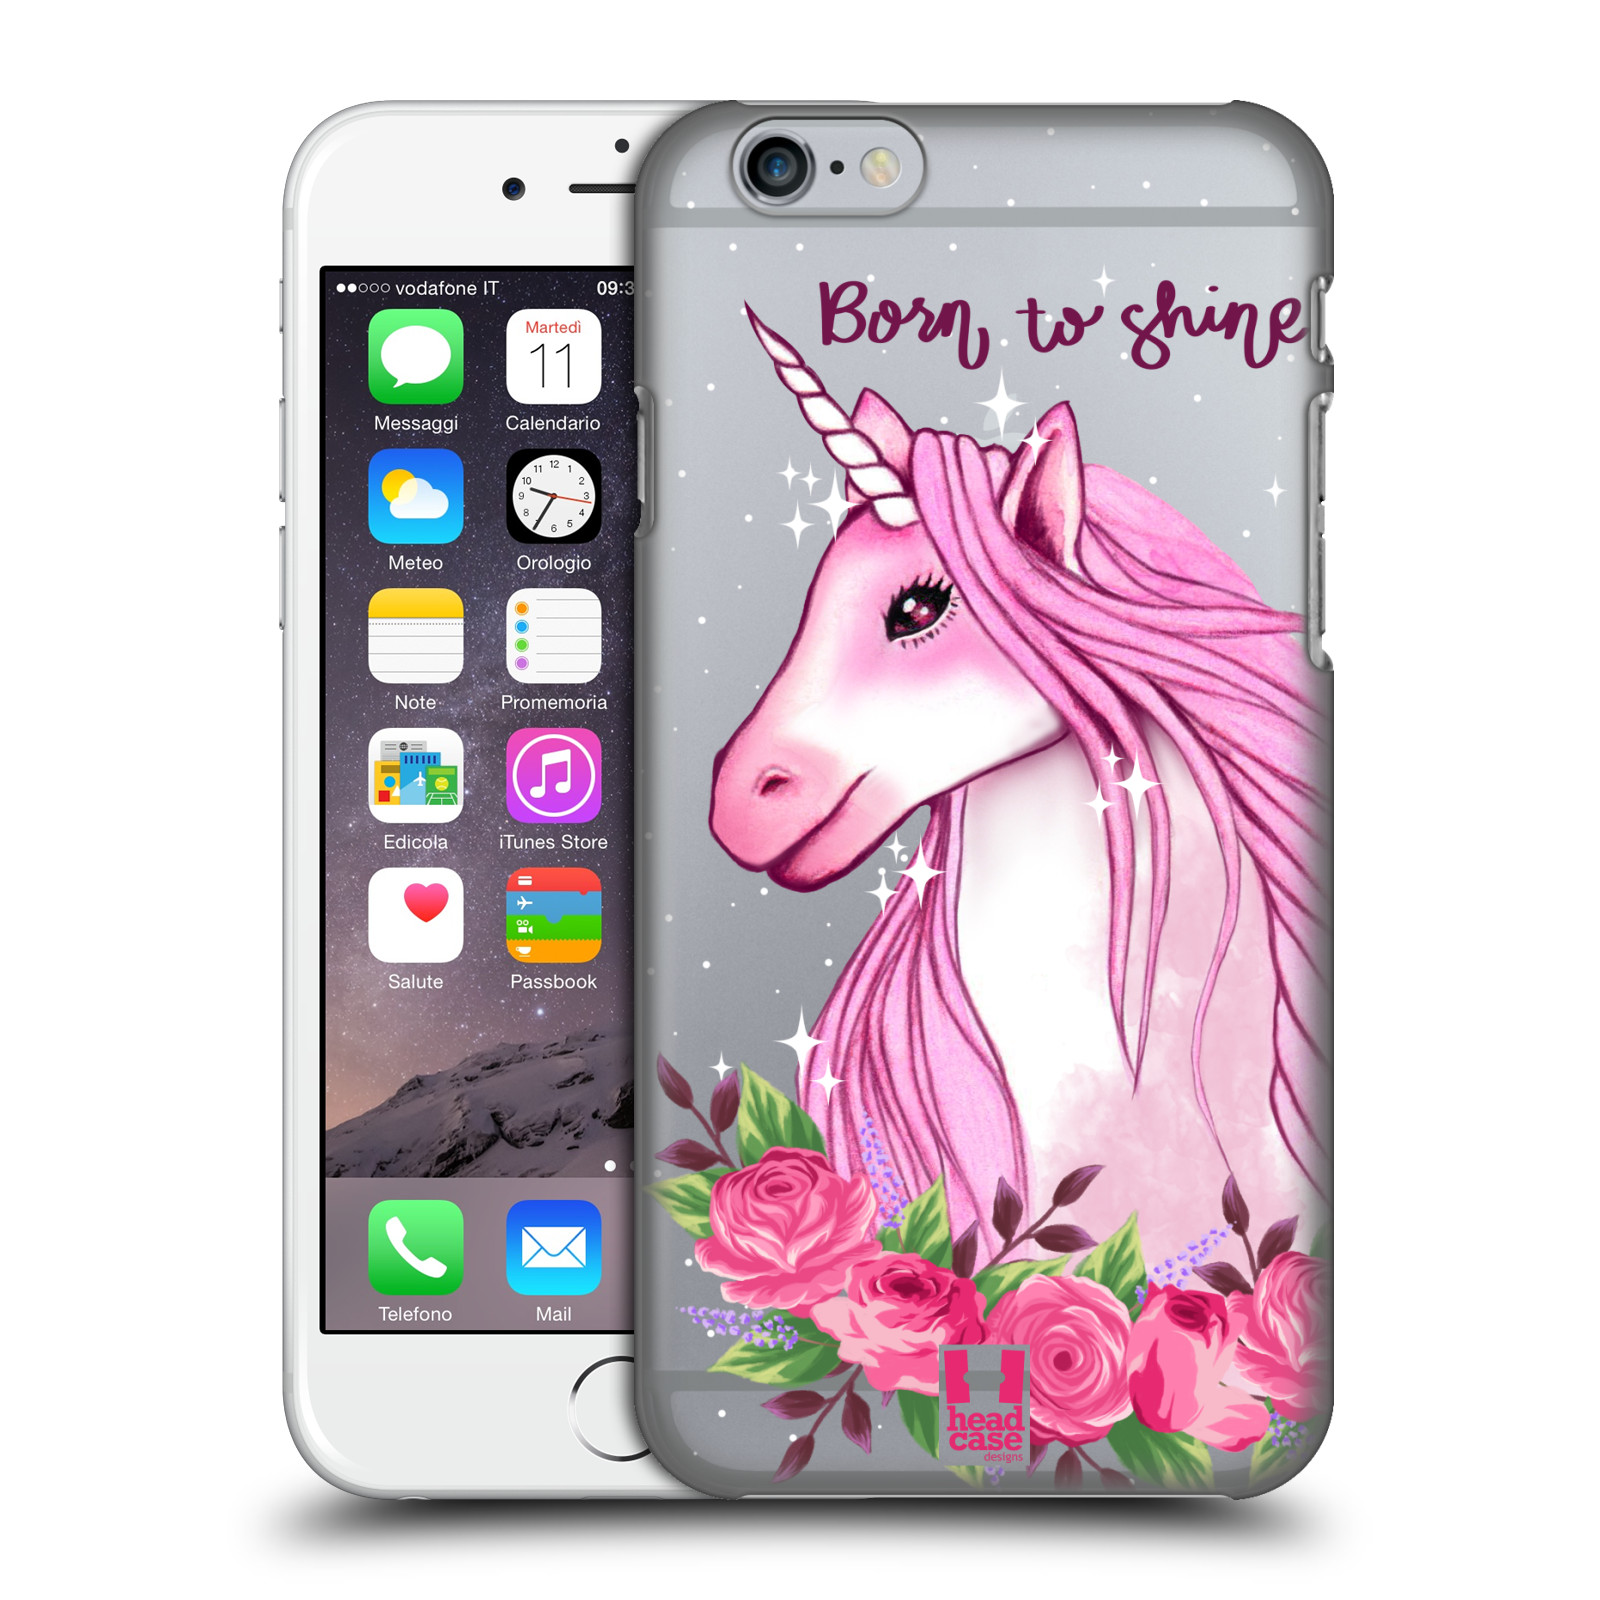 Plastové pouzdro na mobil Apple iPhone 6 - Head Case - Jednorožec - Born to shine